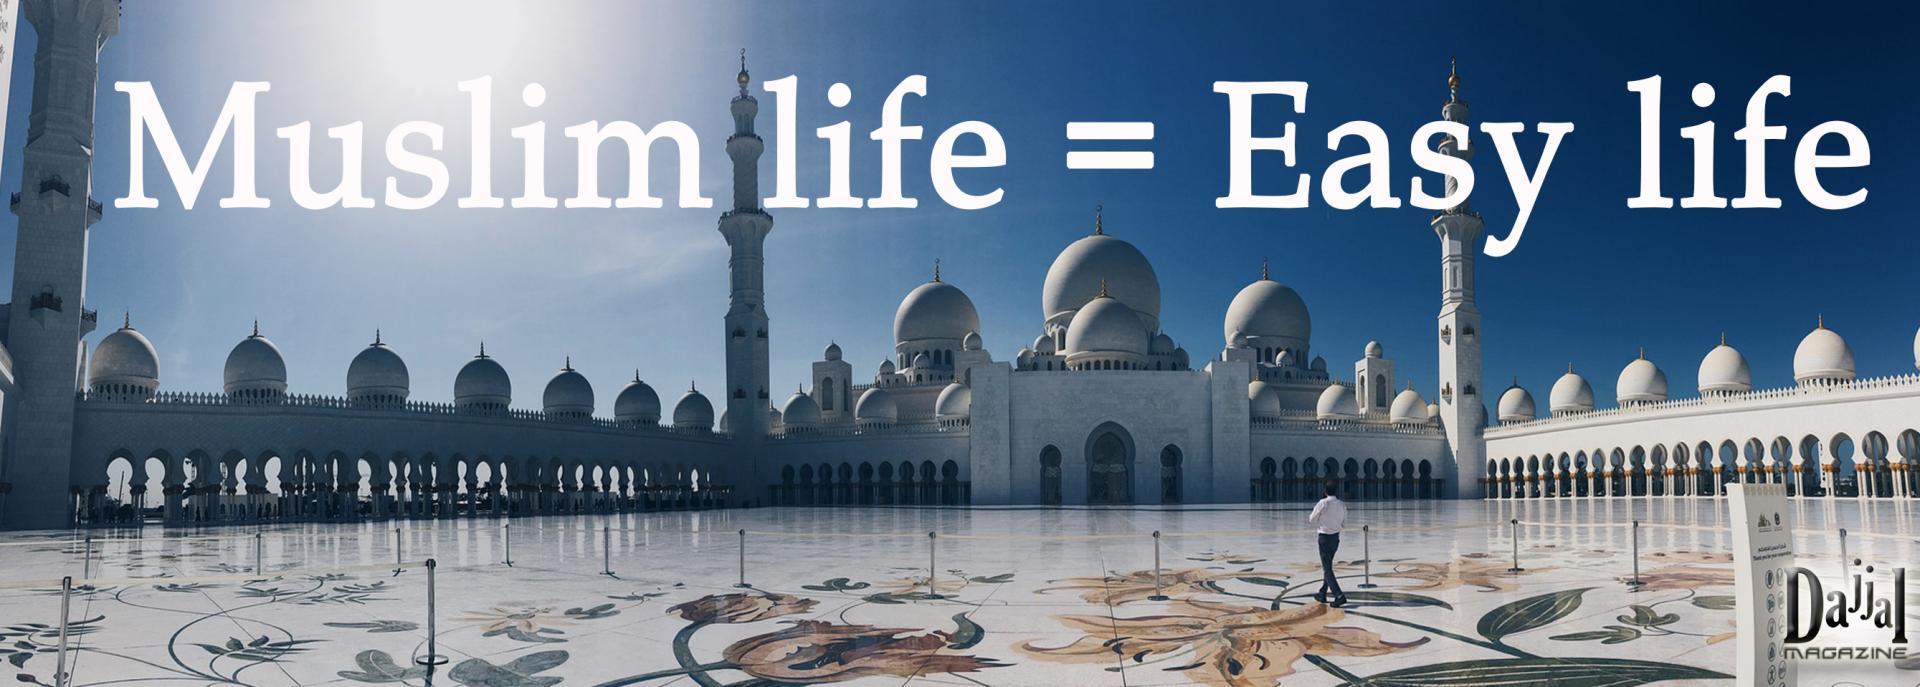 Muslim life easy life